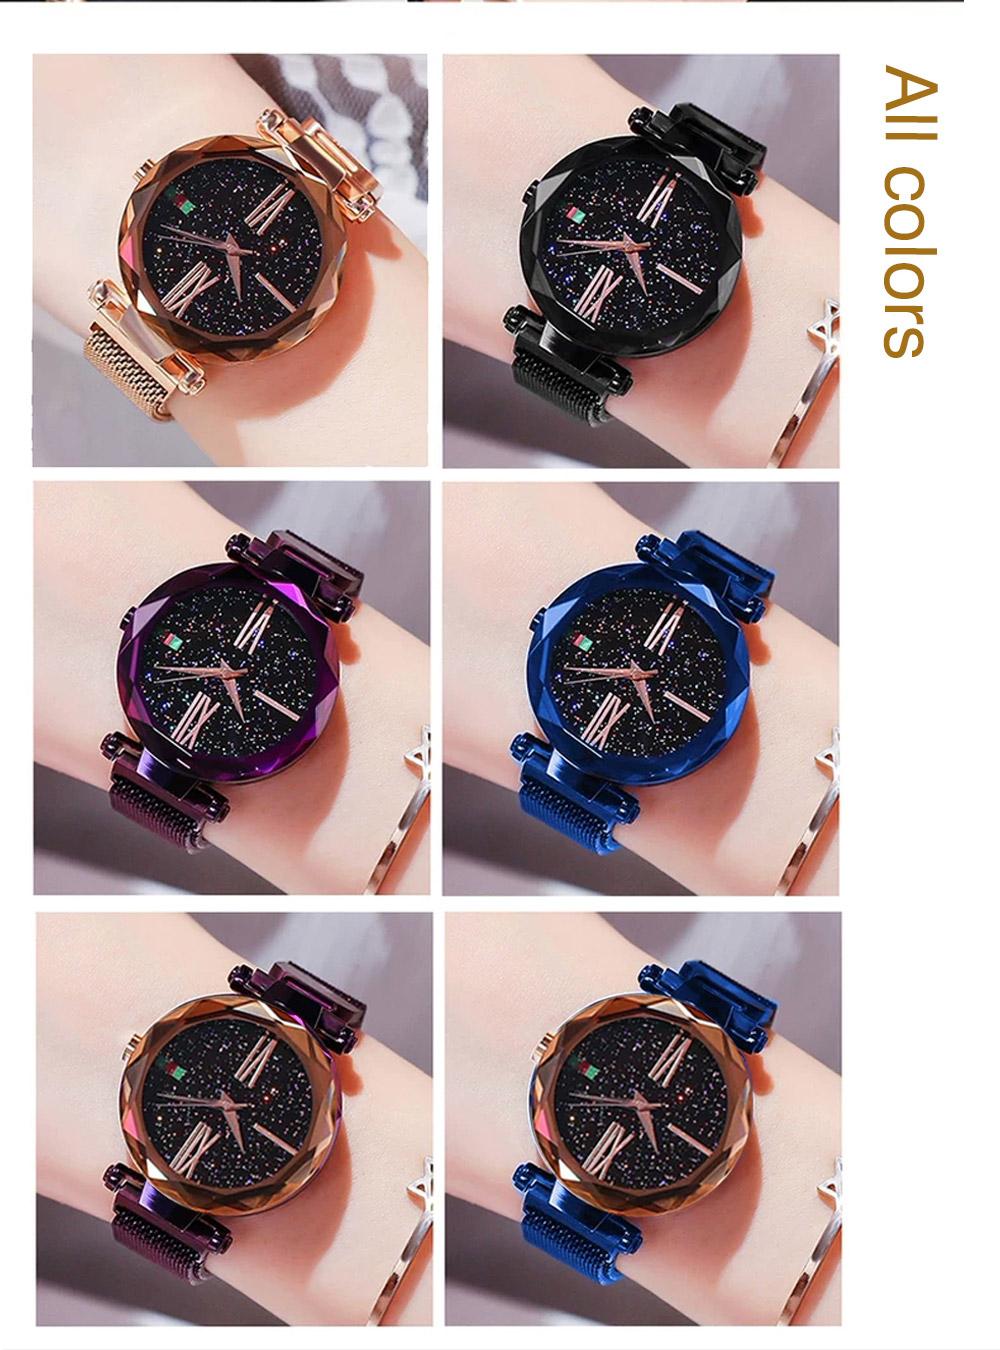 Relojes de lujo chapa oro rosa para mujer 12